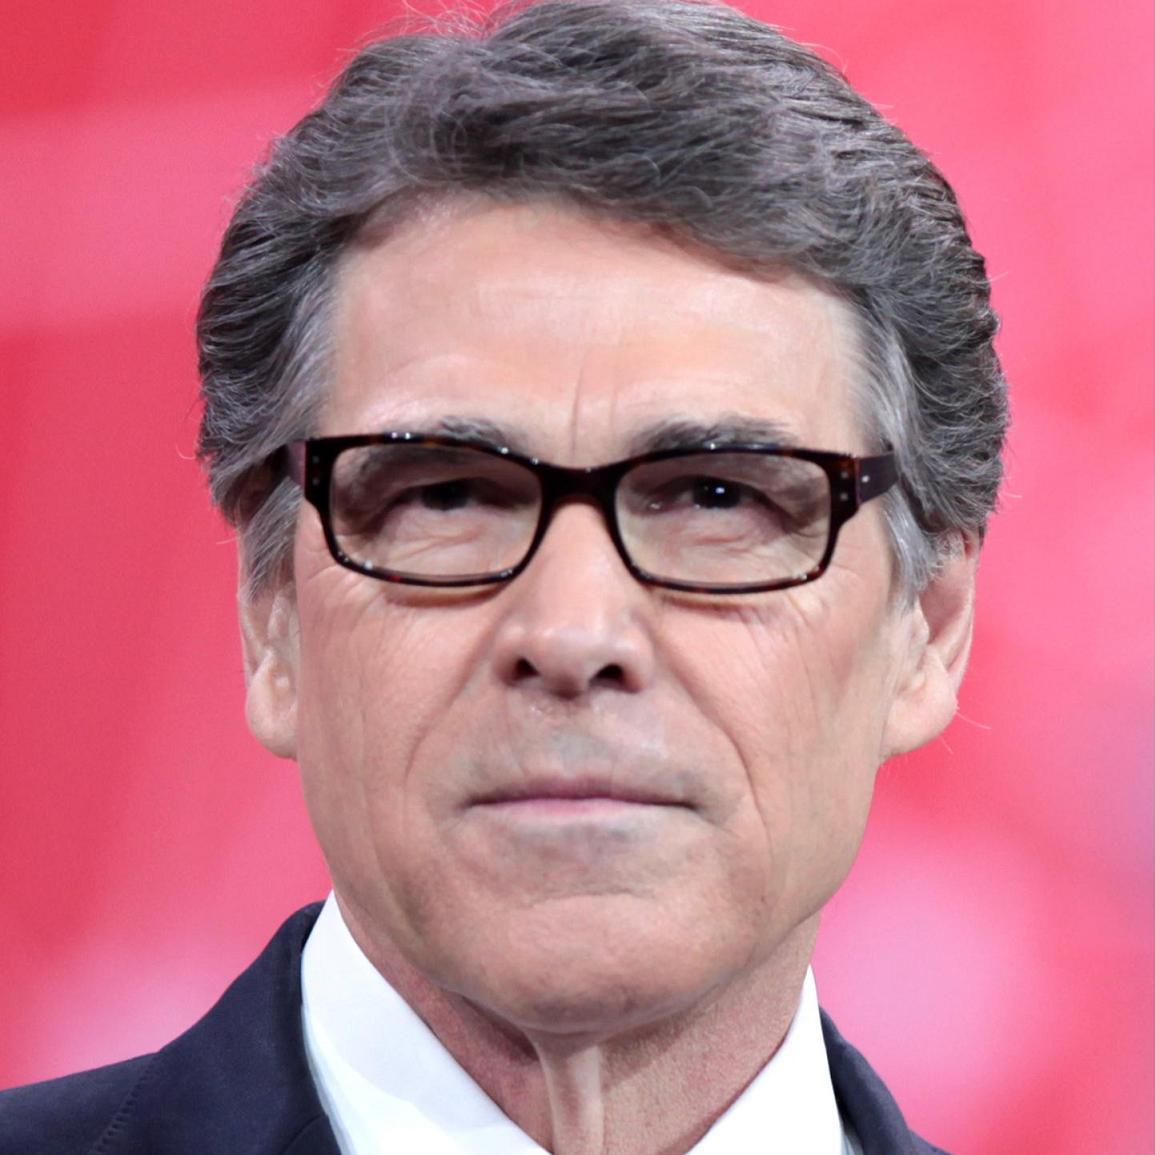 Rick Perry Bio, Net Worth, Facts